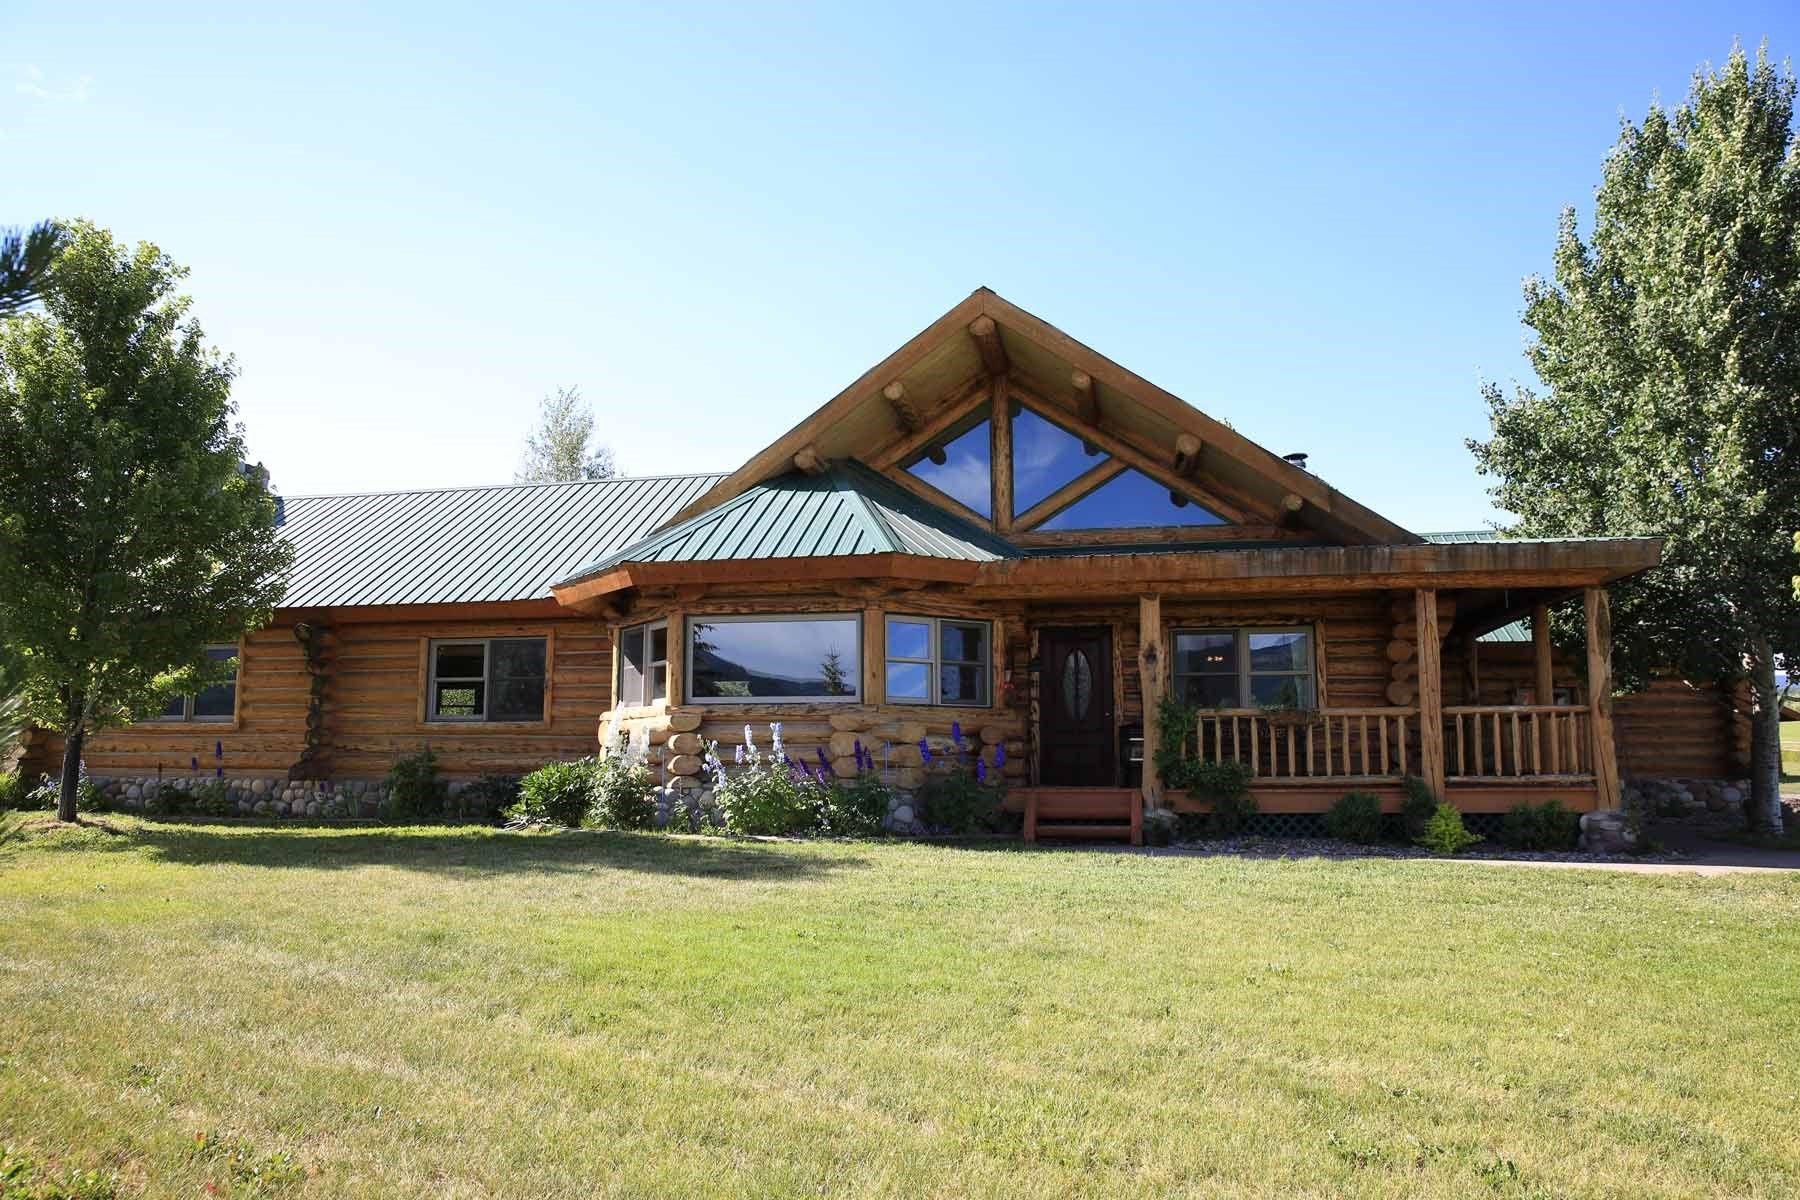 studios for uk sale colorado outdoor rooms luxury cambridge garden x coton cabins bespoke log